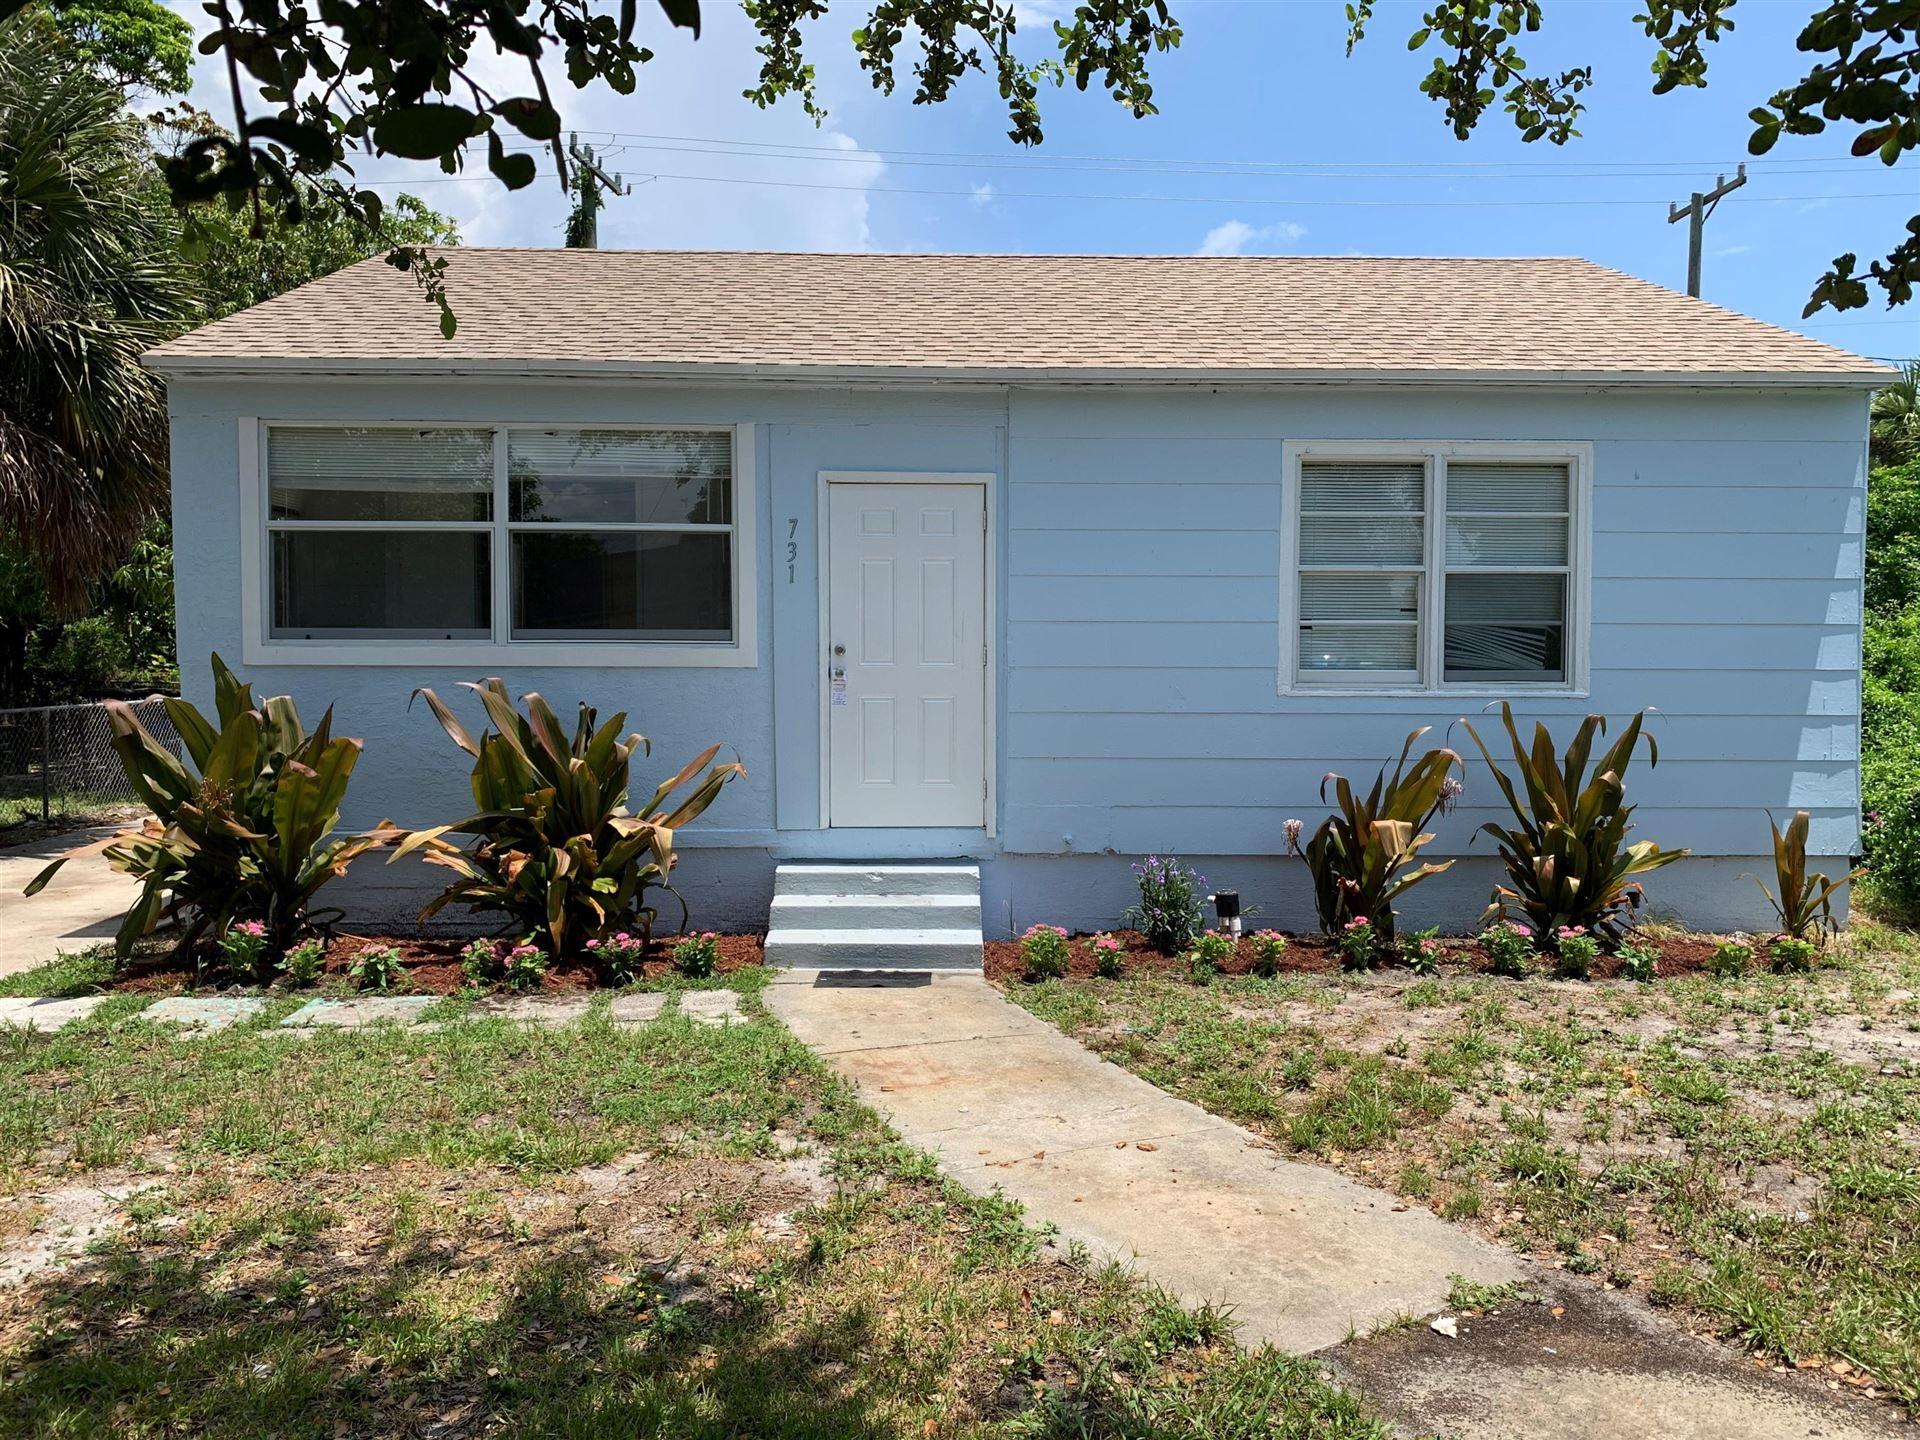 731 50th Street, West Palm Beach, FL 33407 - #: RX-10636961